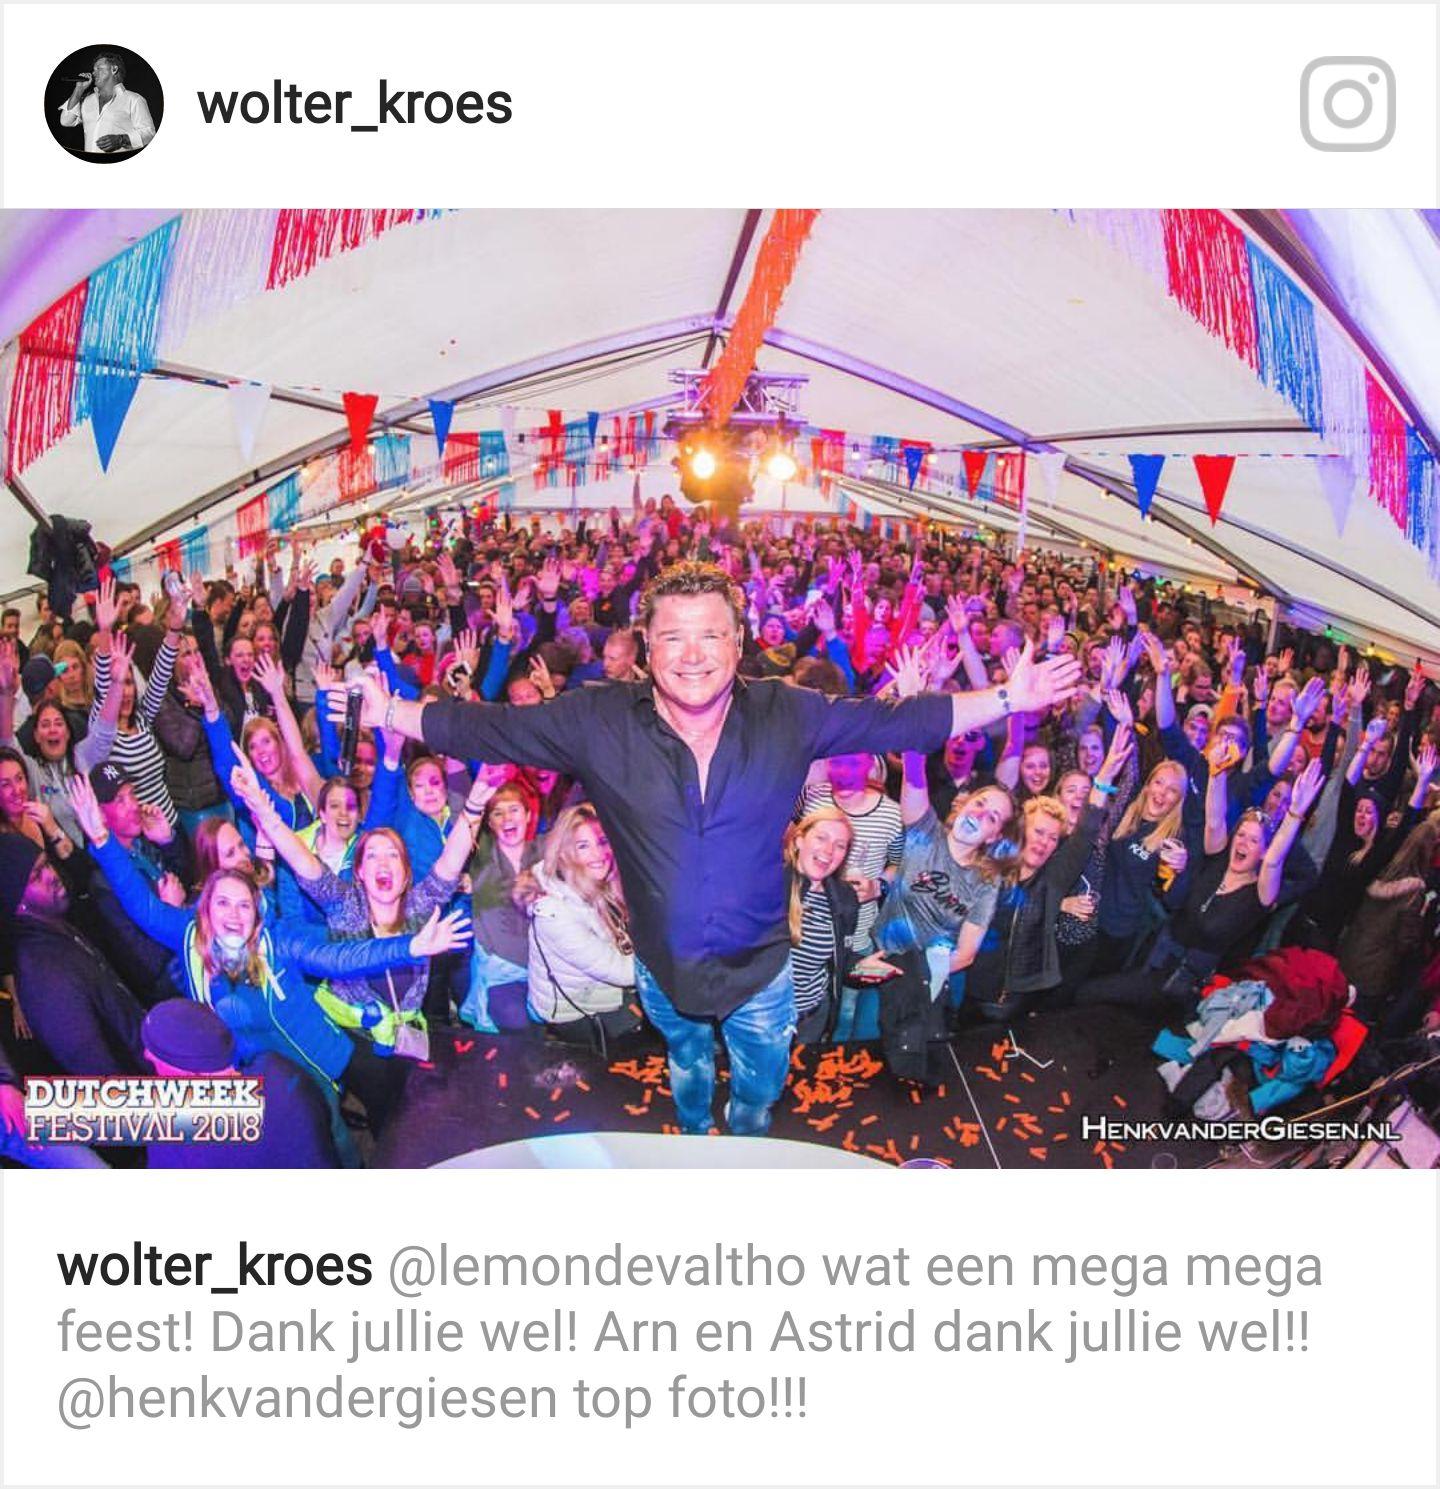 Feesten met Wolter Kroes!